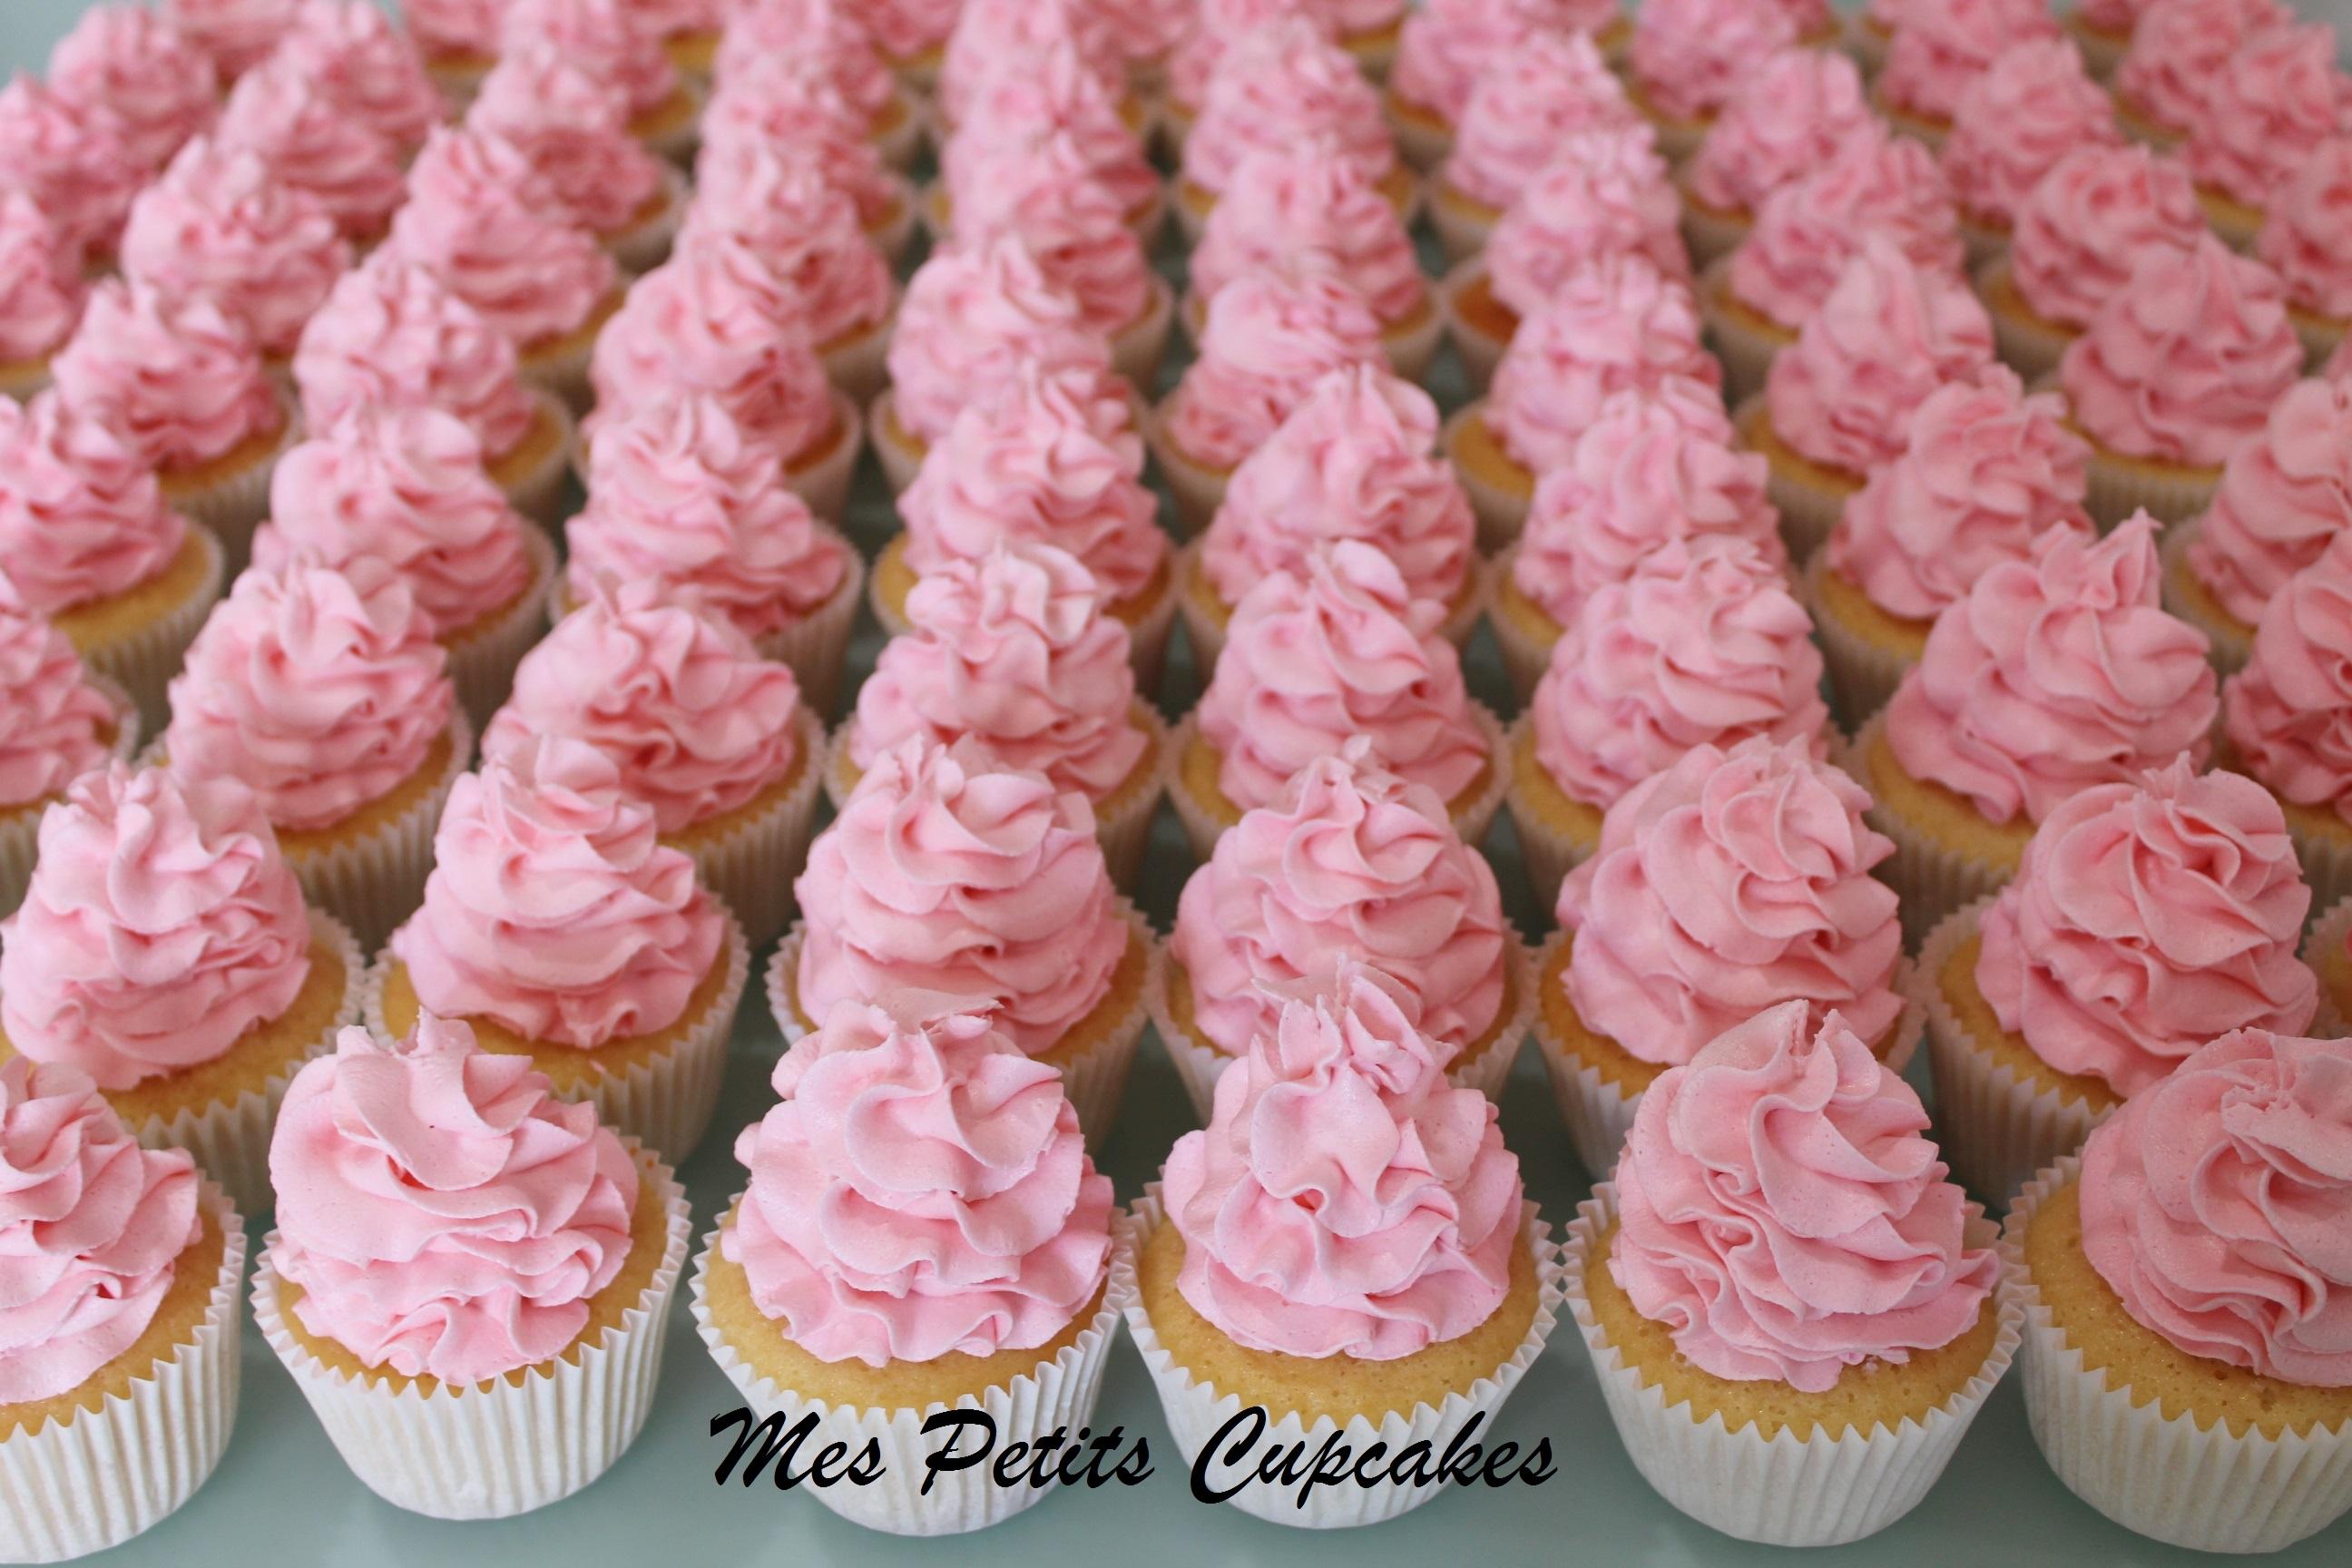 Cupcake - Pink and White Cupcakes